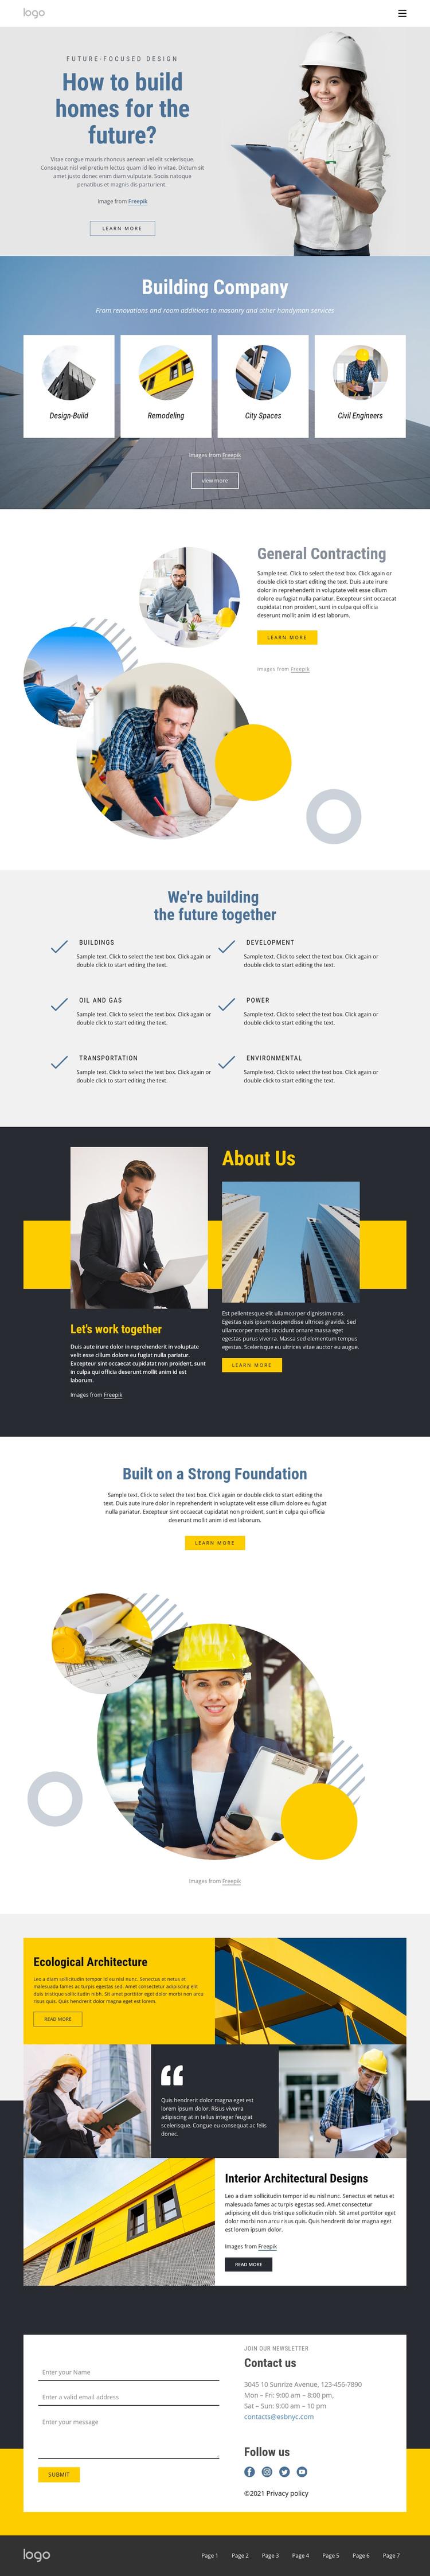 General contracting company Website Builder Software